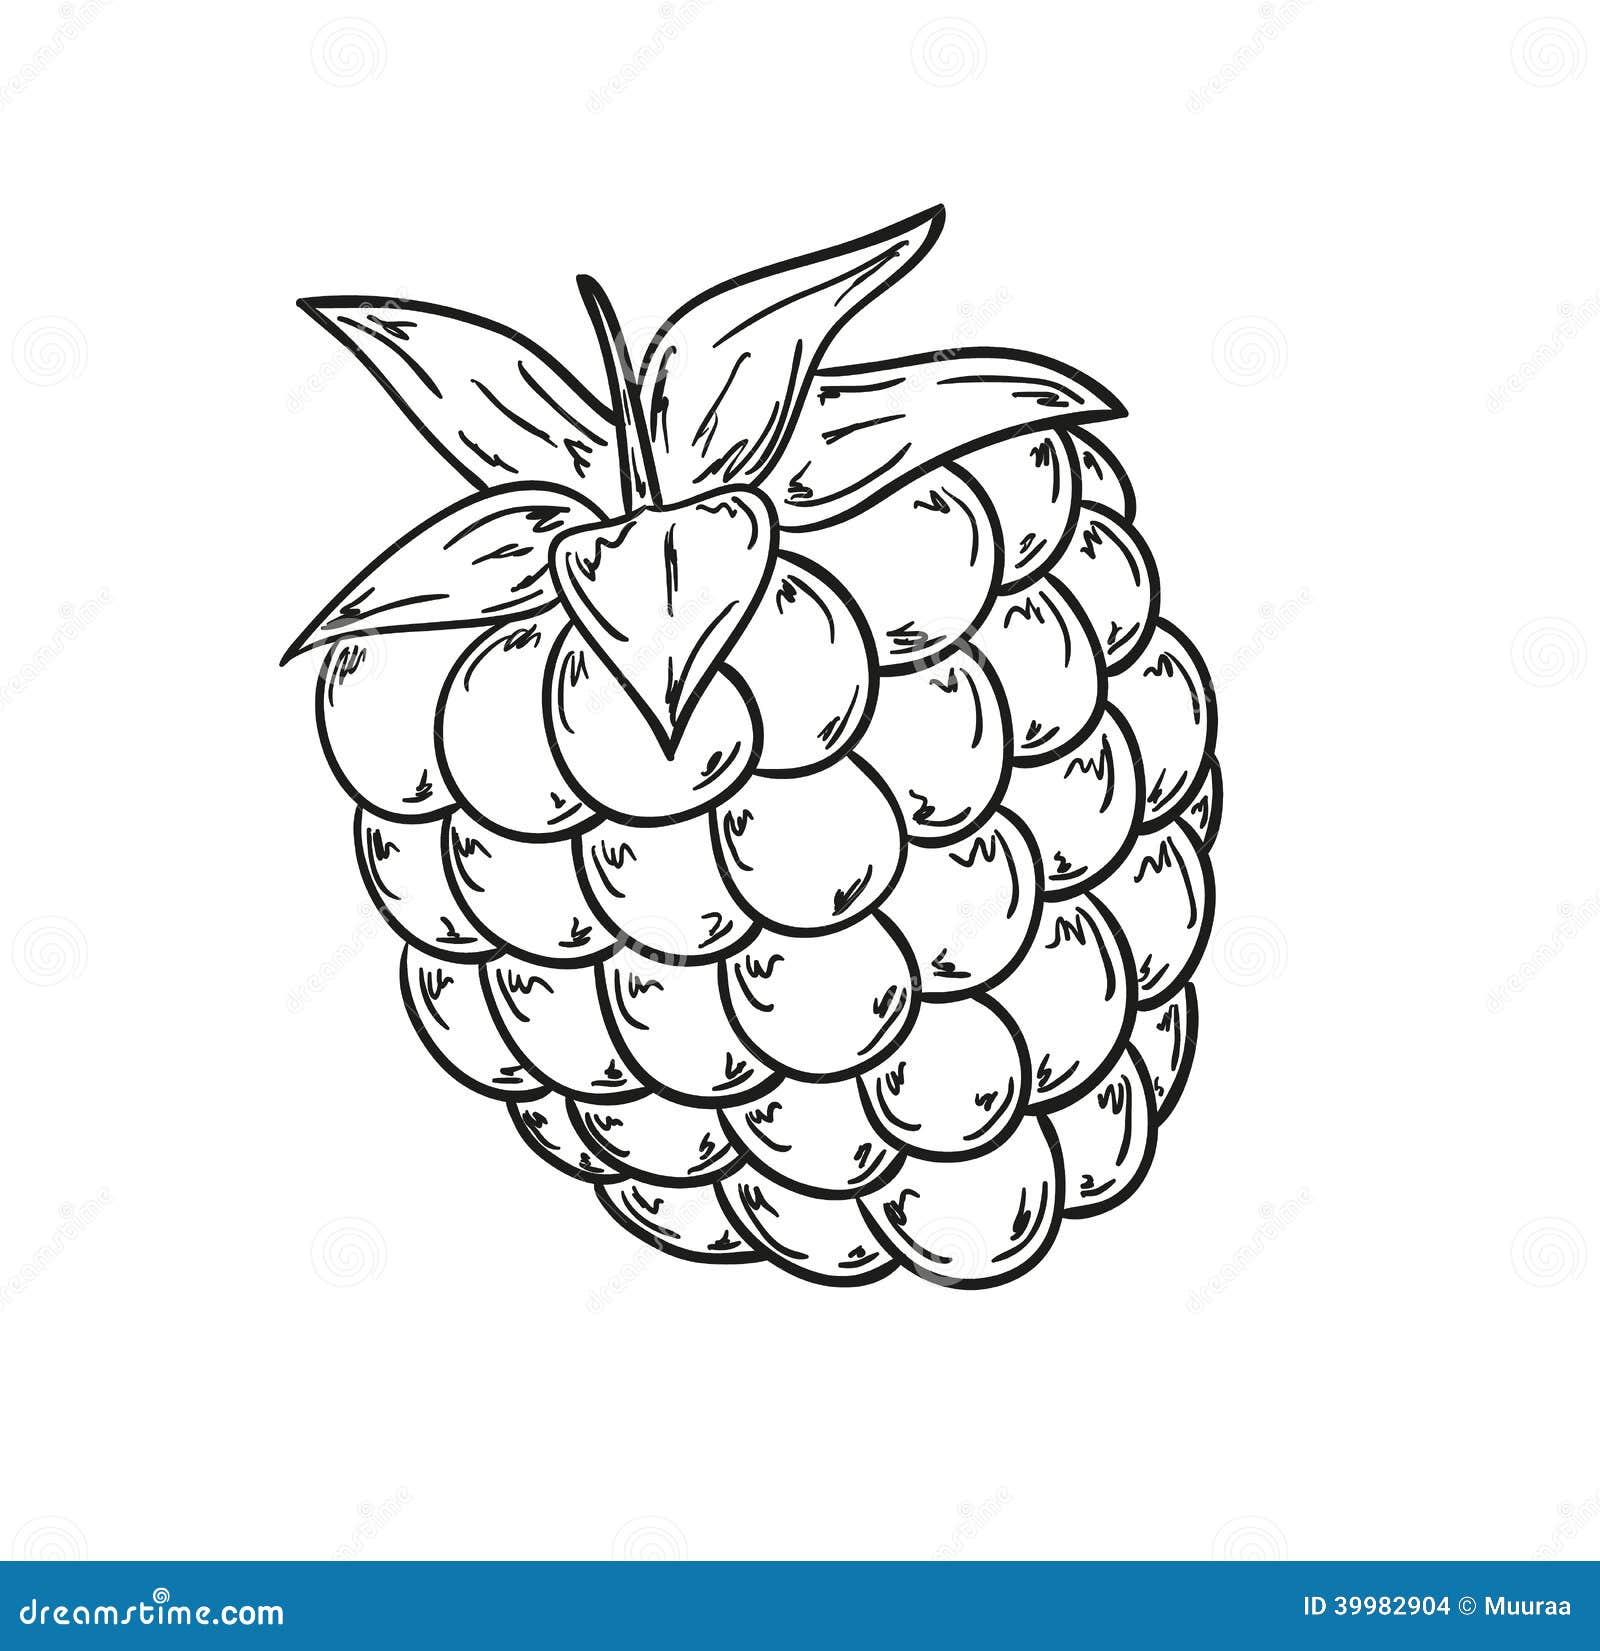 Raspberry sketch stock illustration. Illustration of drawn ...